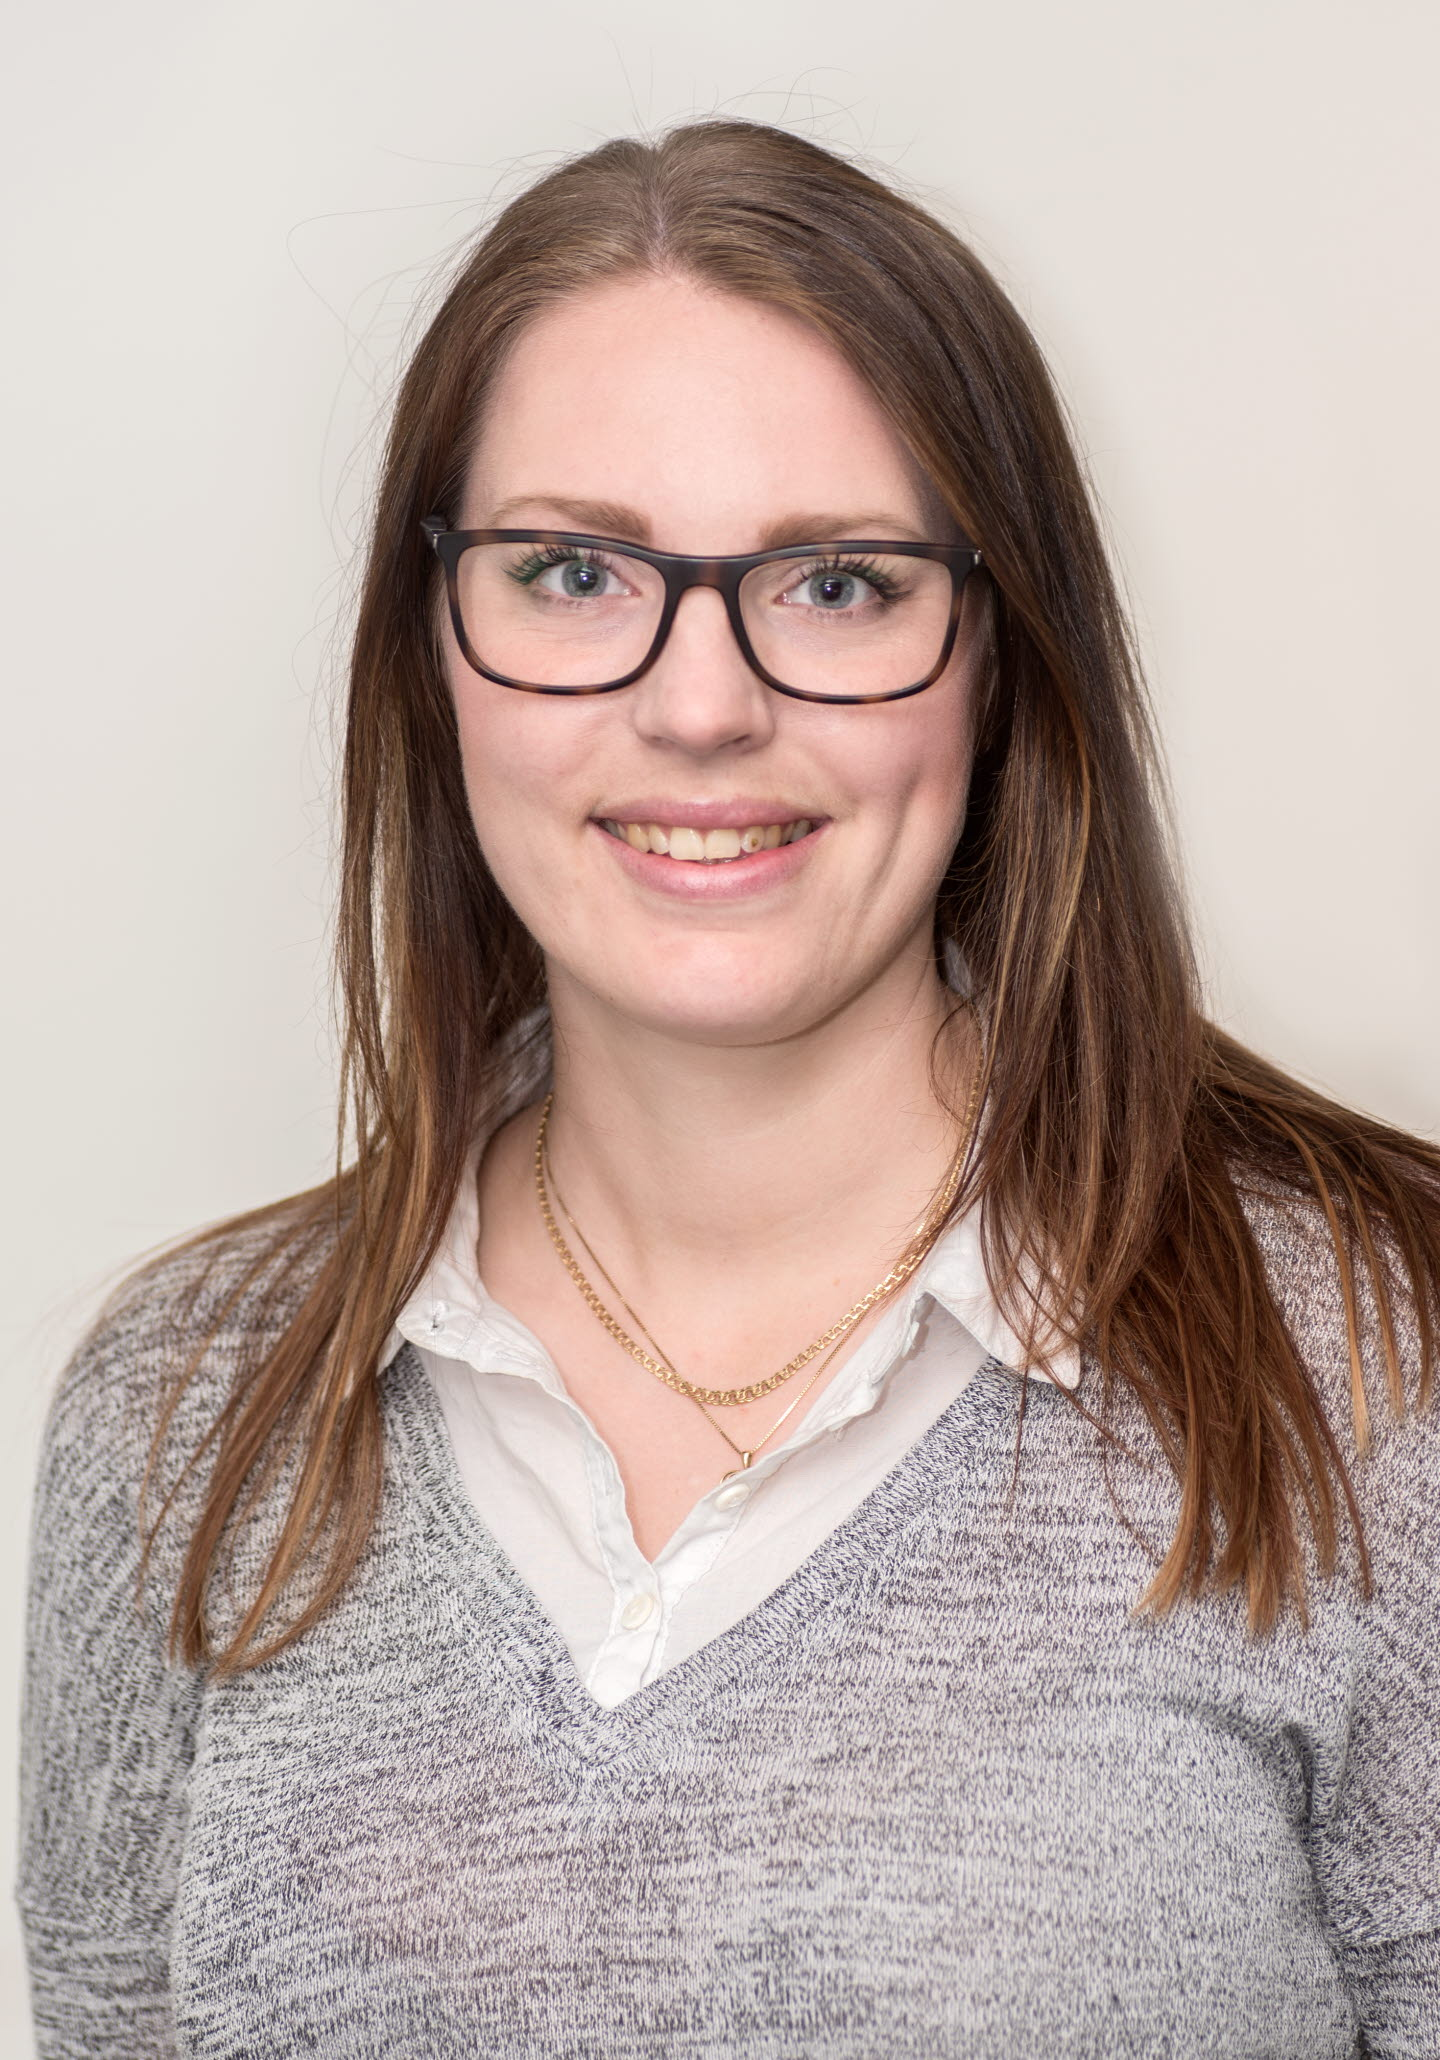 Sandra Larsson, SCA Sourcing & Logistics